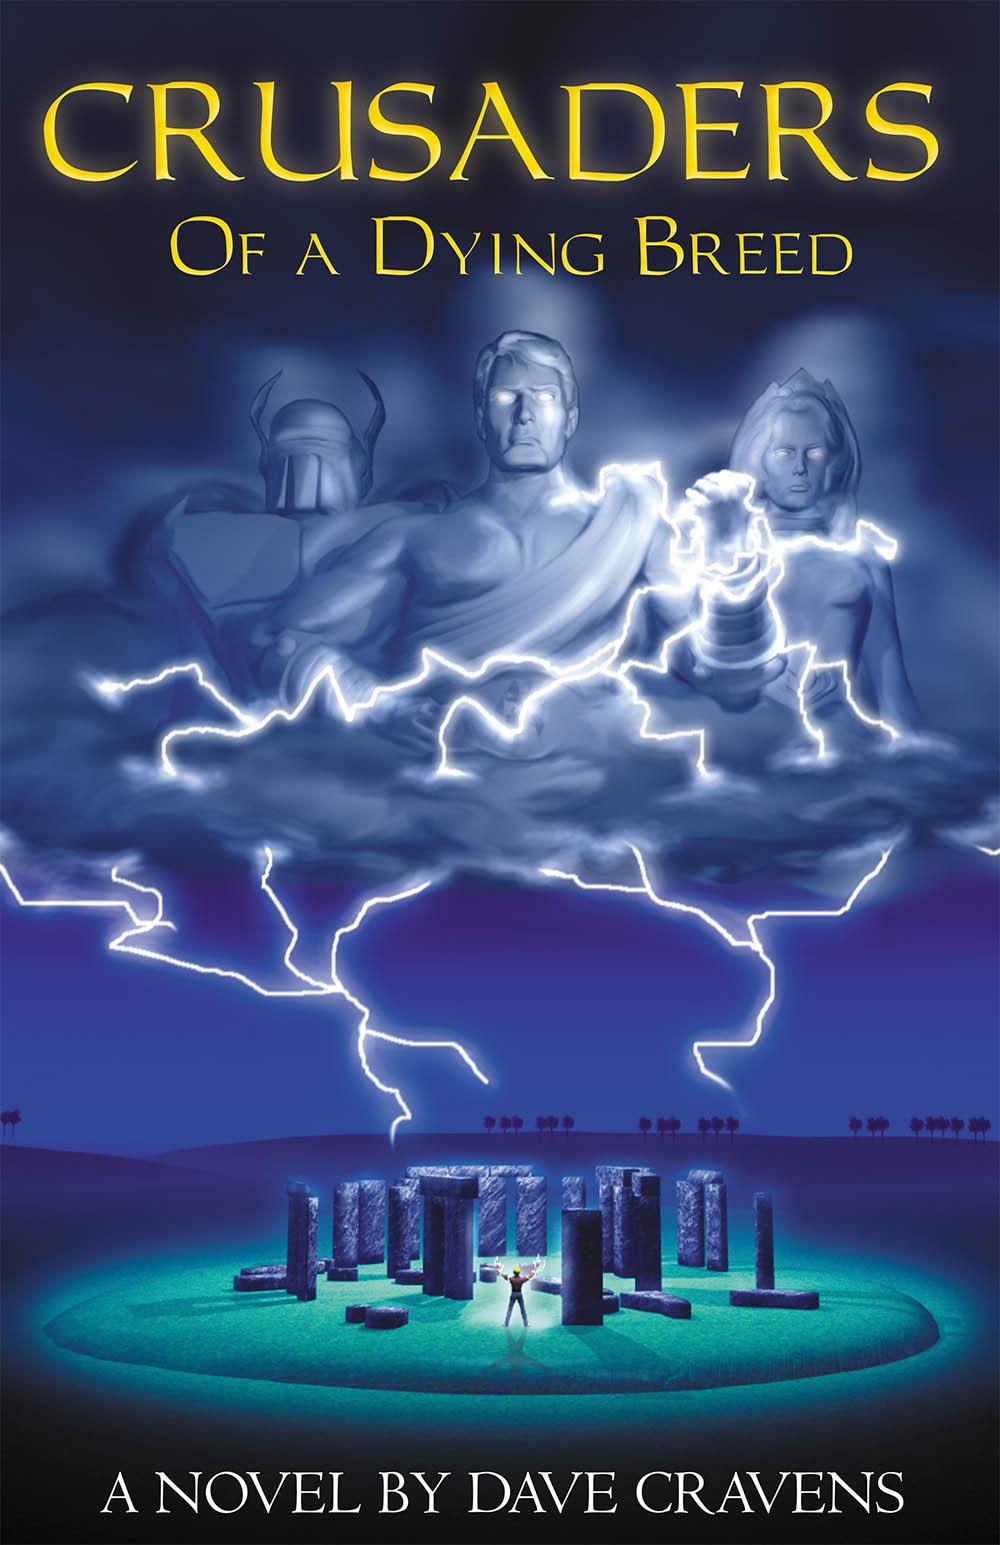 Original cover art from 1999.